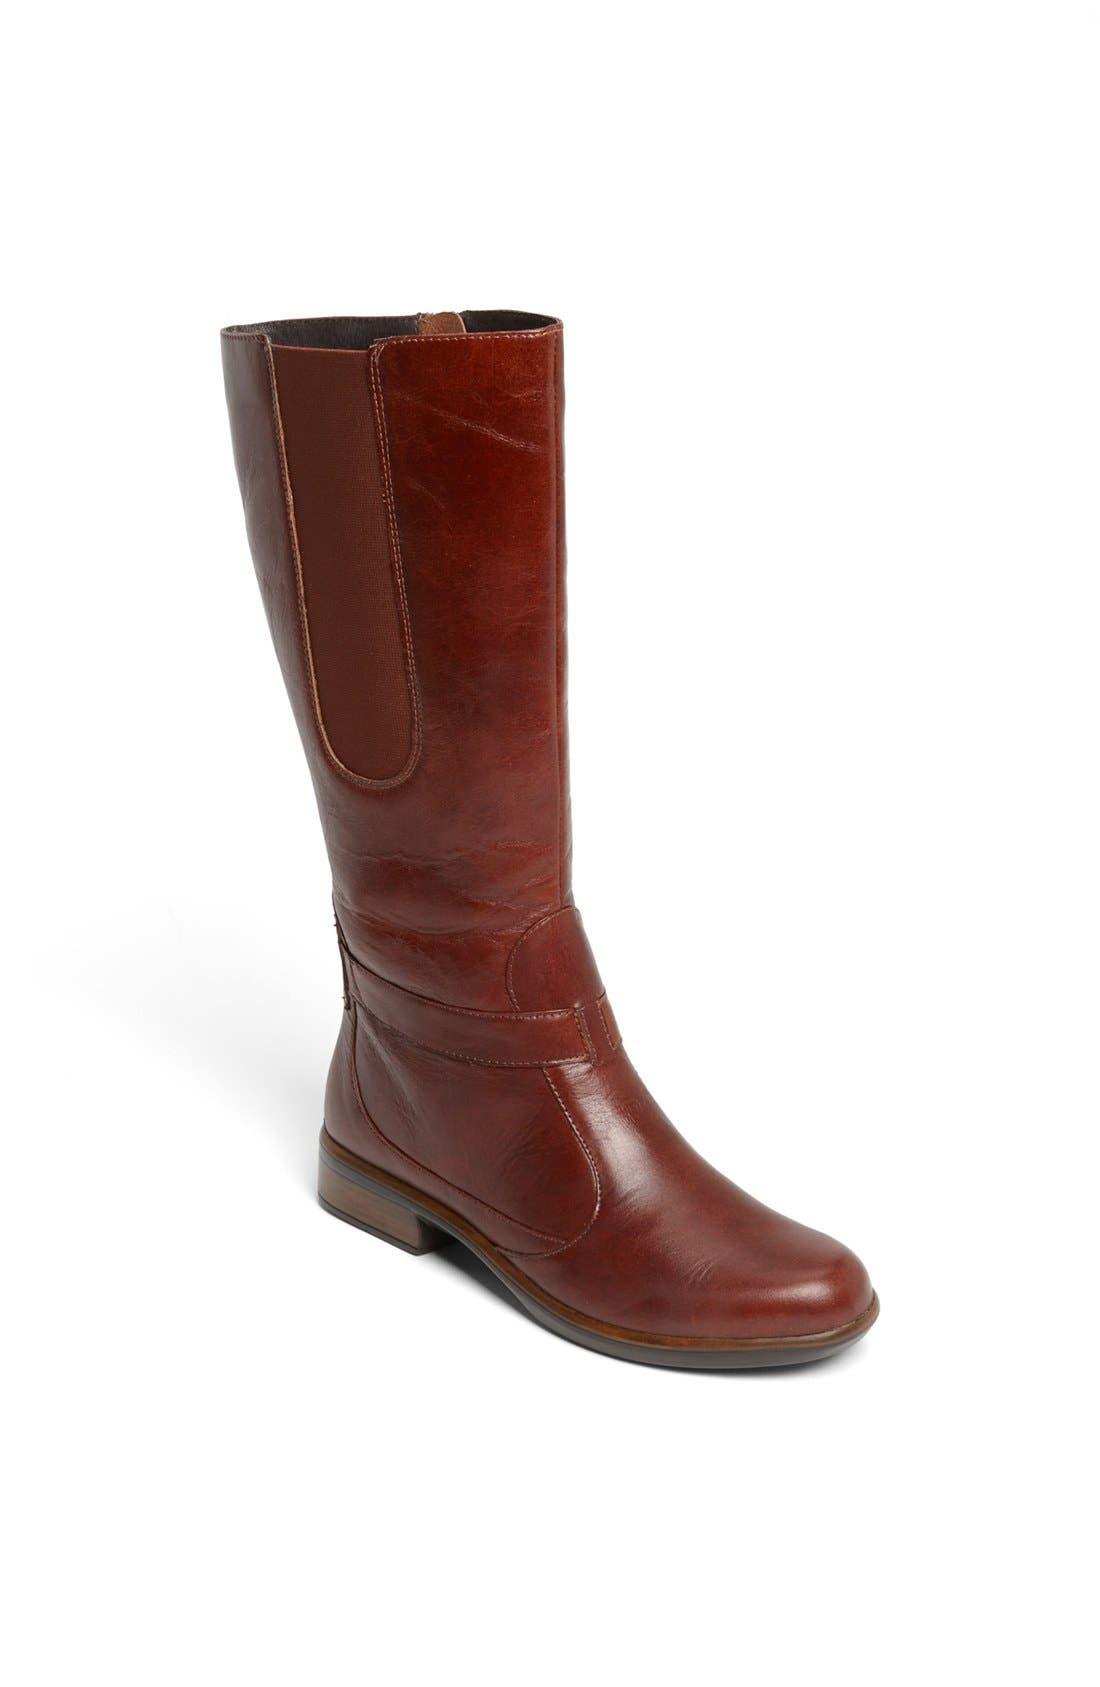 Main Image - Naot 'Viento' Boot